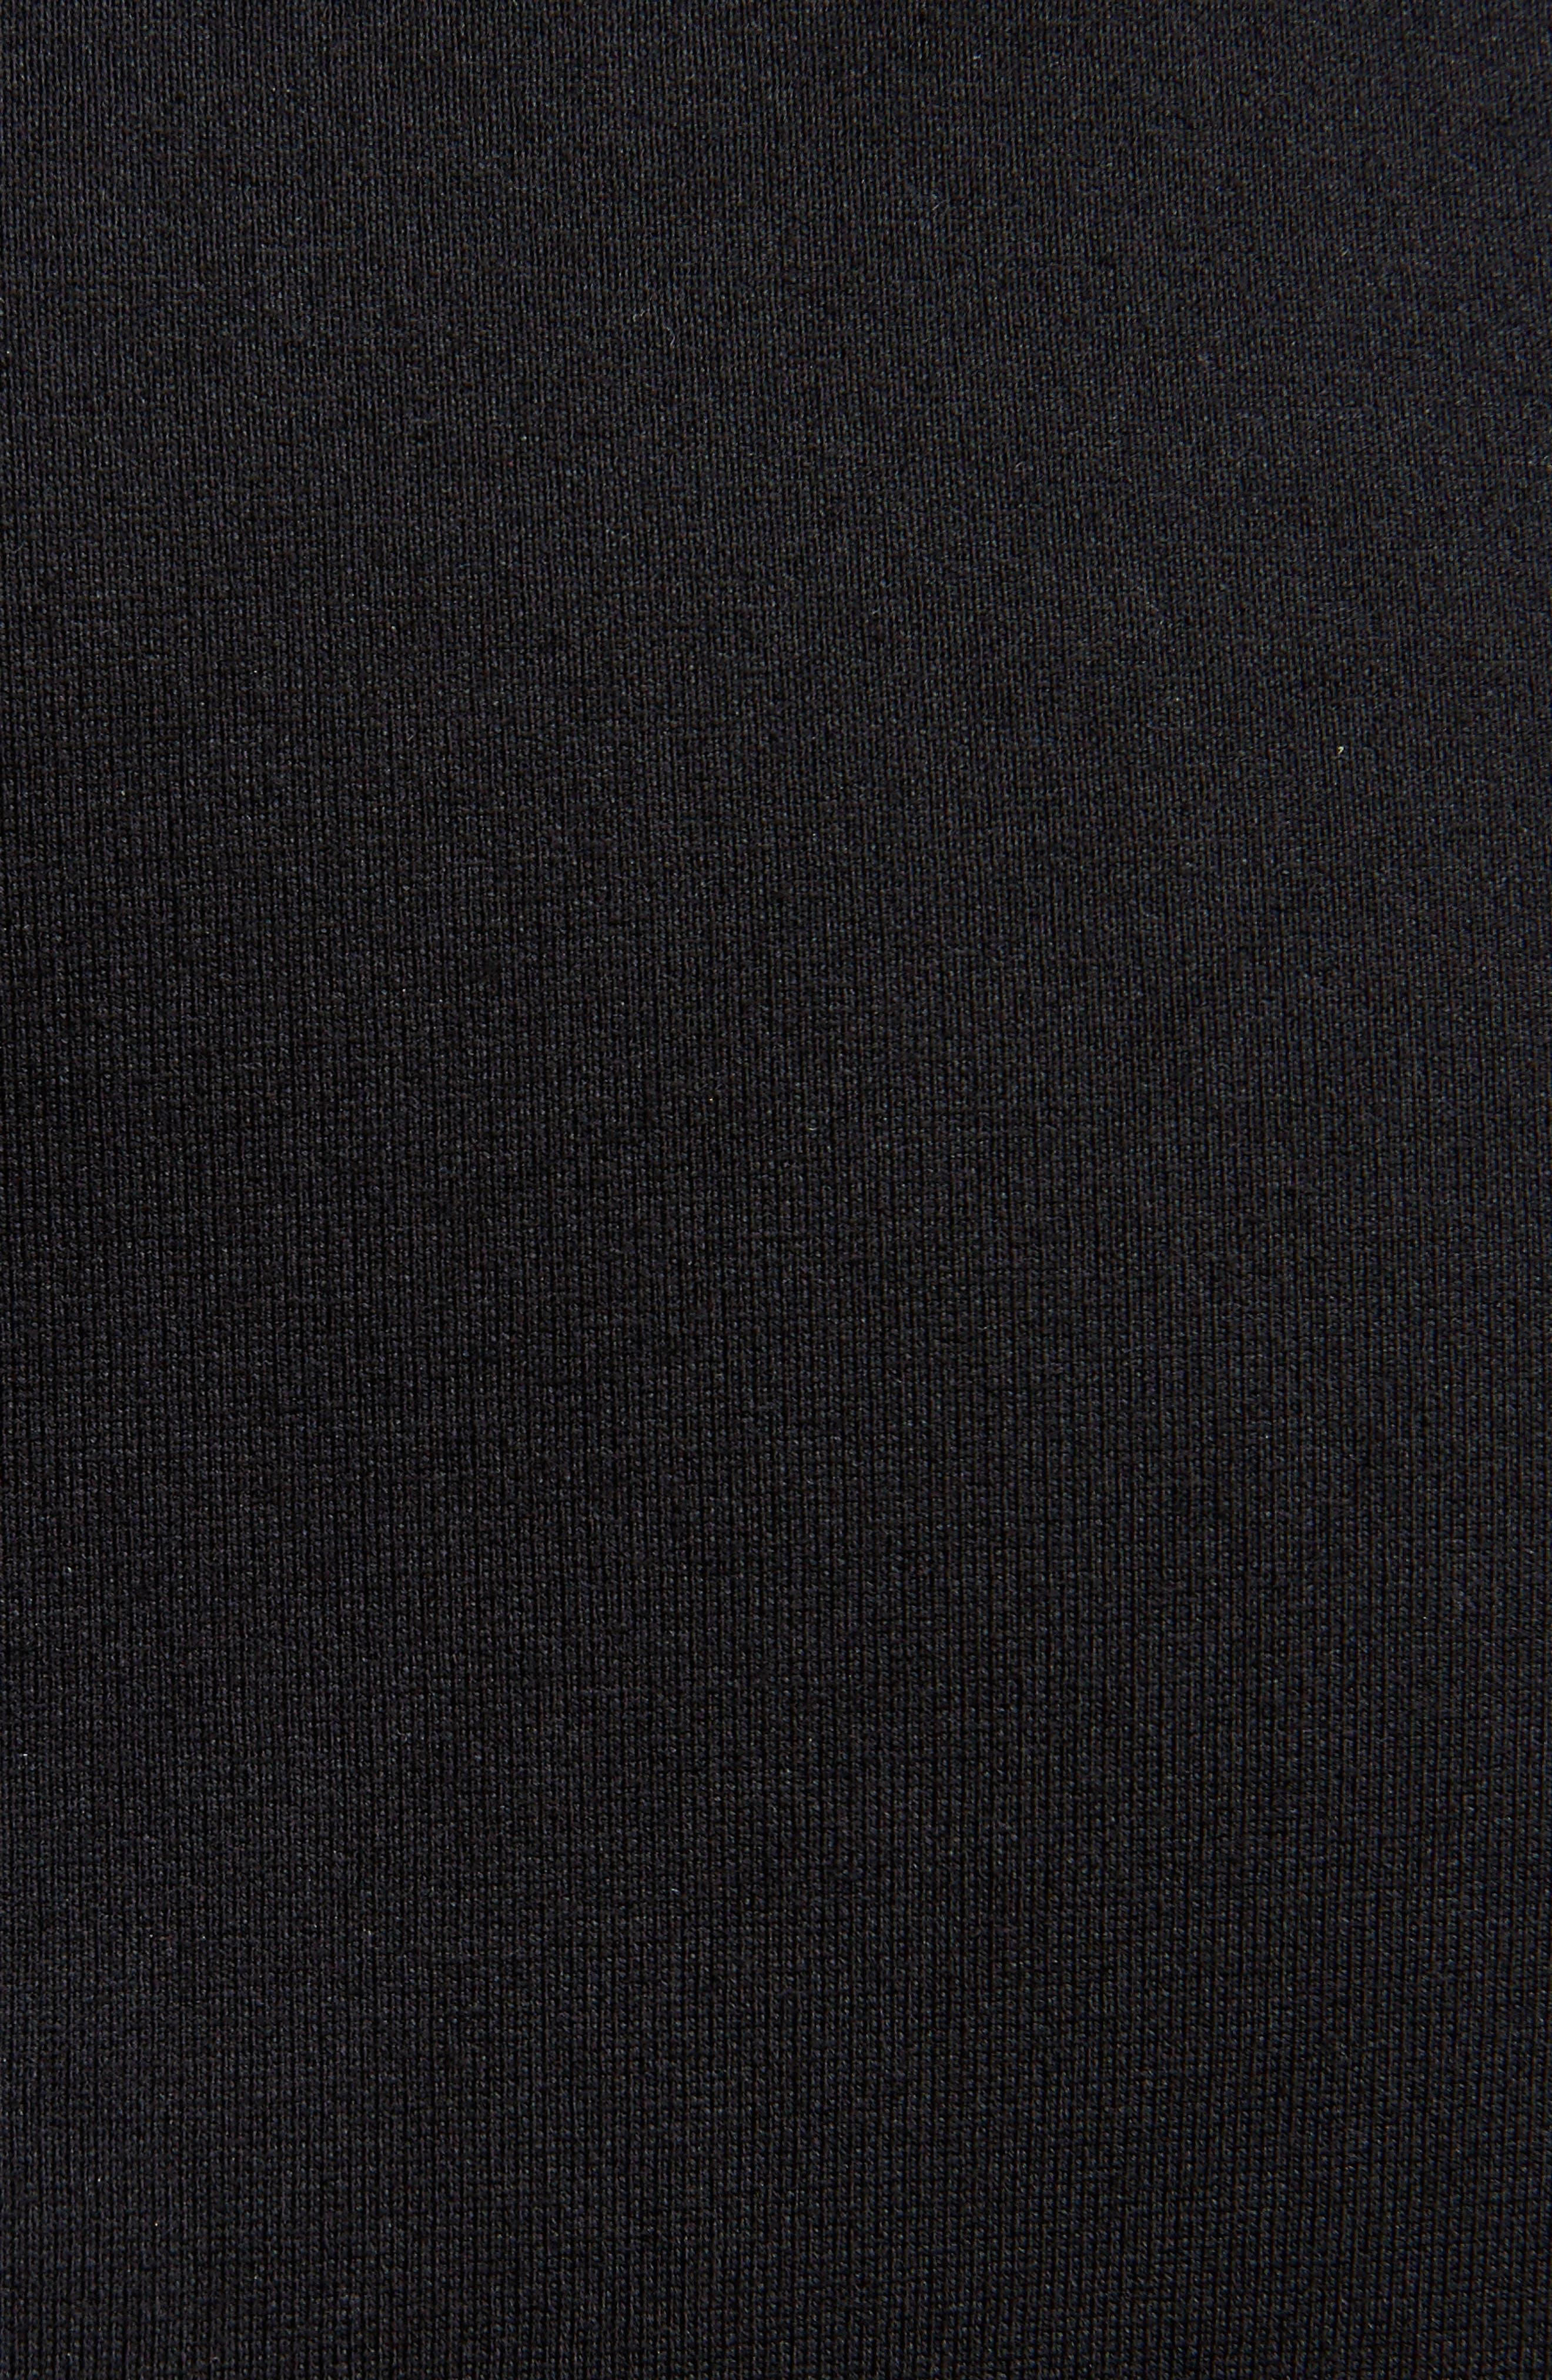 Asymmetrical Ruffle Skirt,                             Alternate thumbnail 5, color,                             001